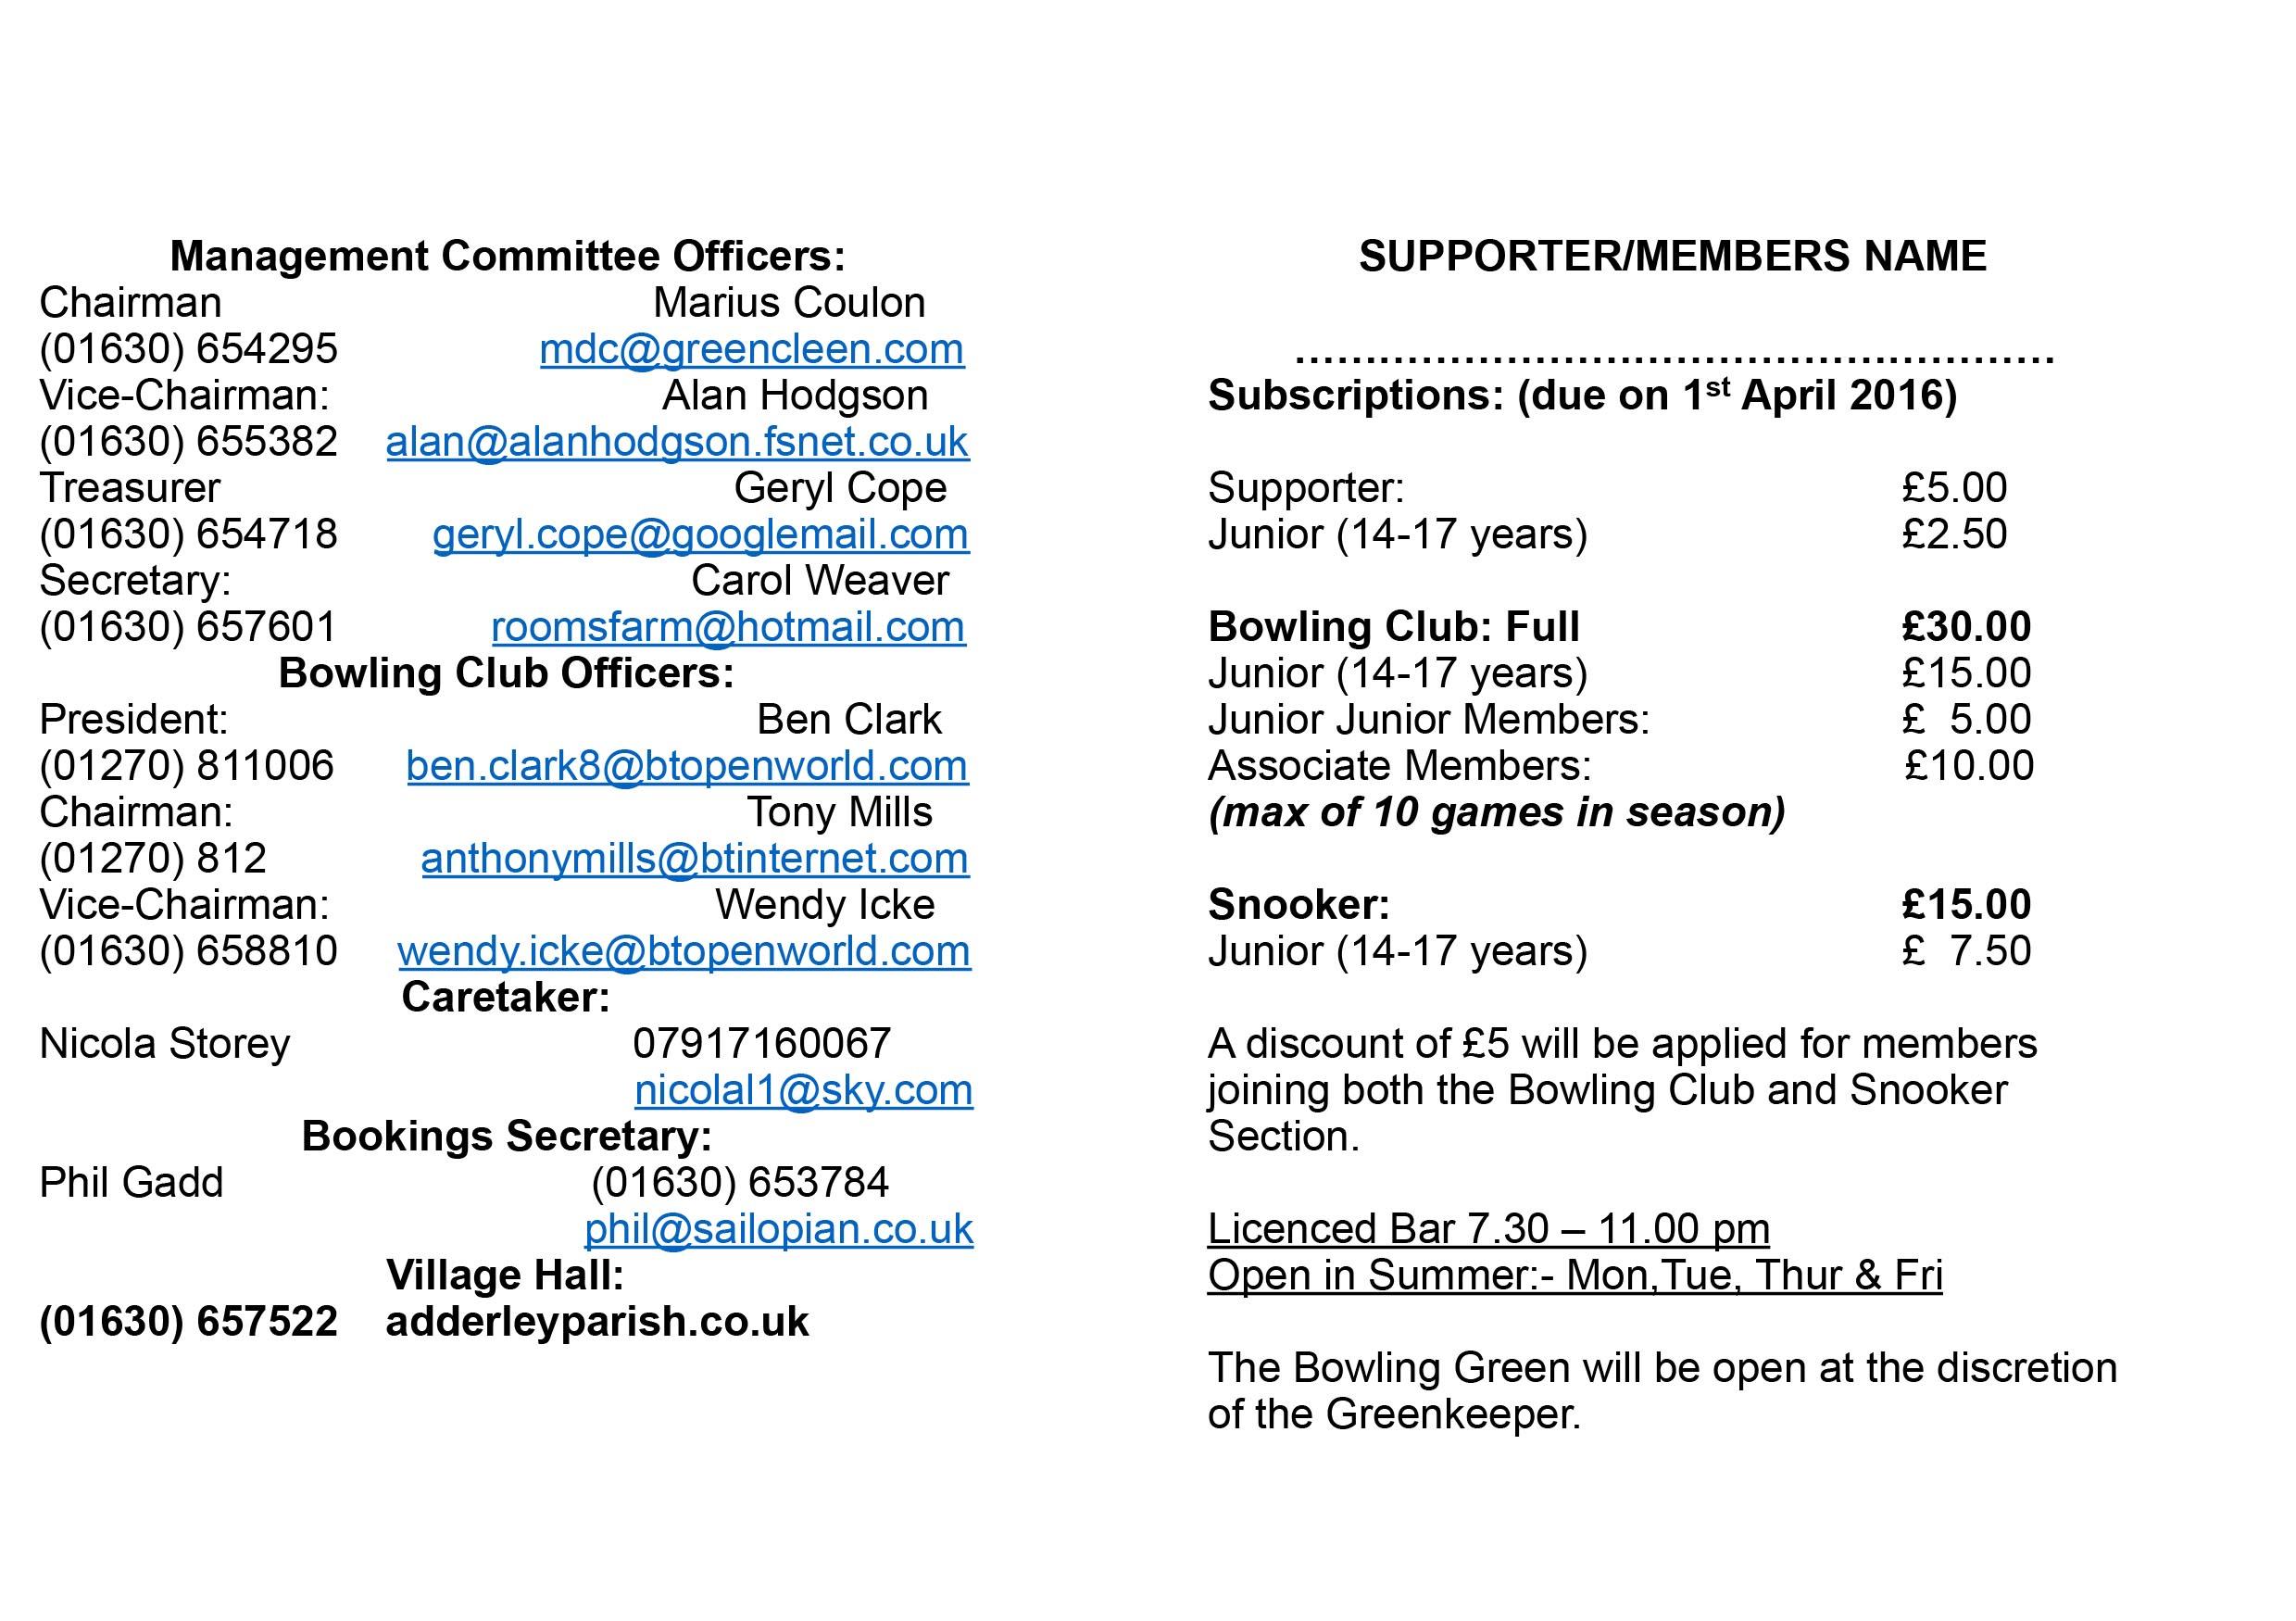 Village Hall Membership Card